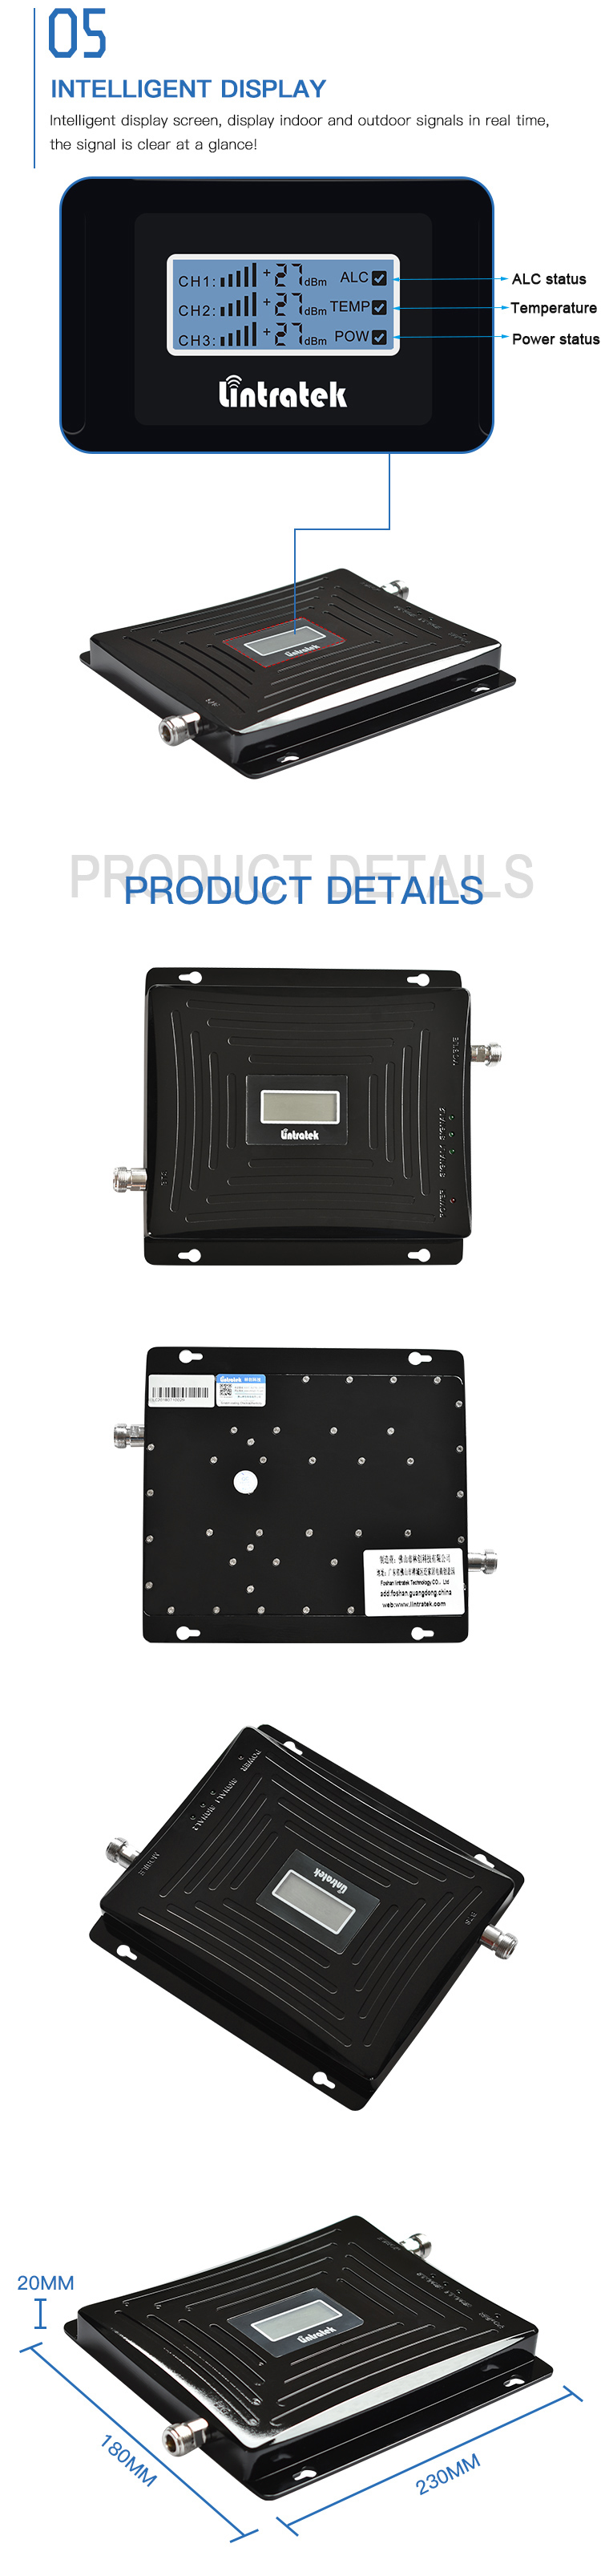 850mhz CDW GSM Amplifier 4